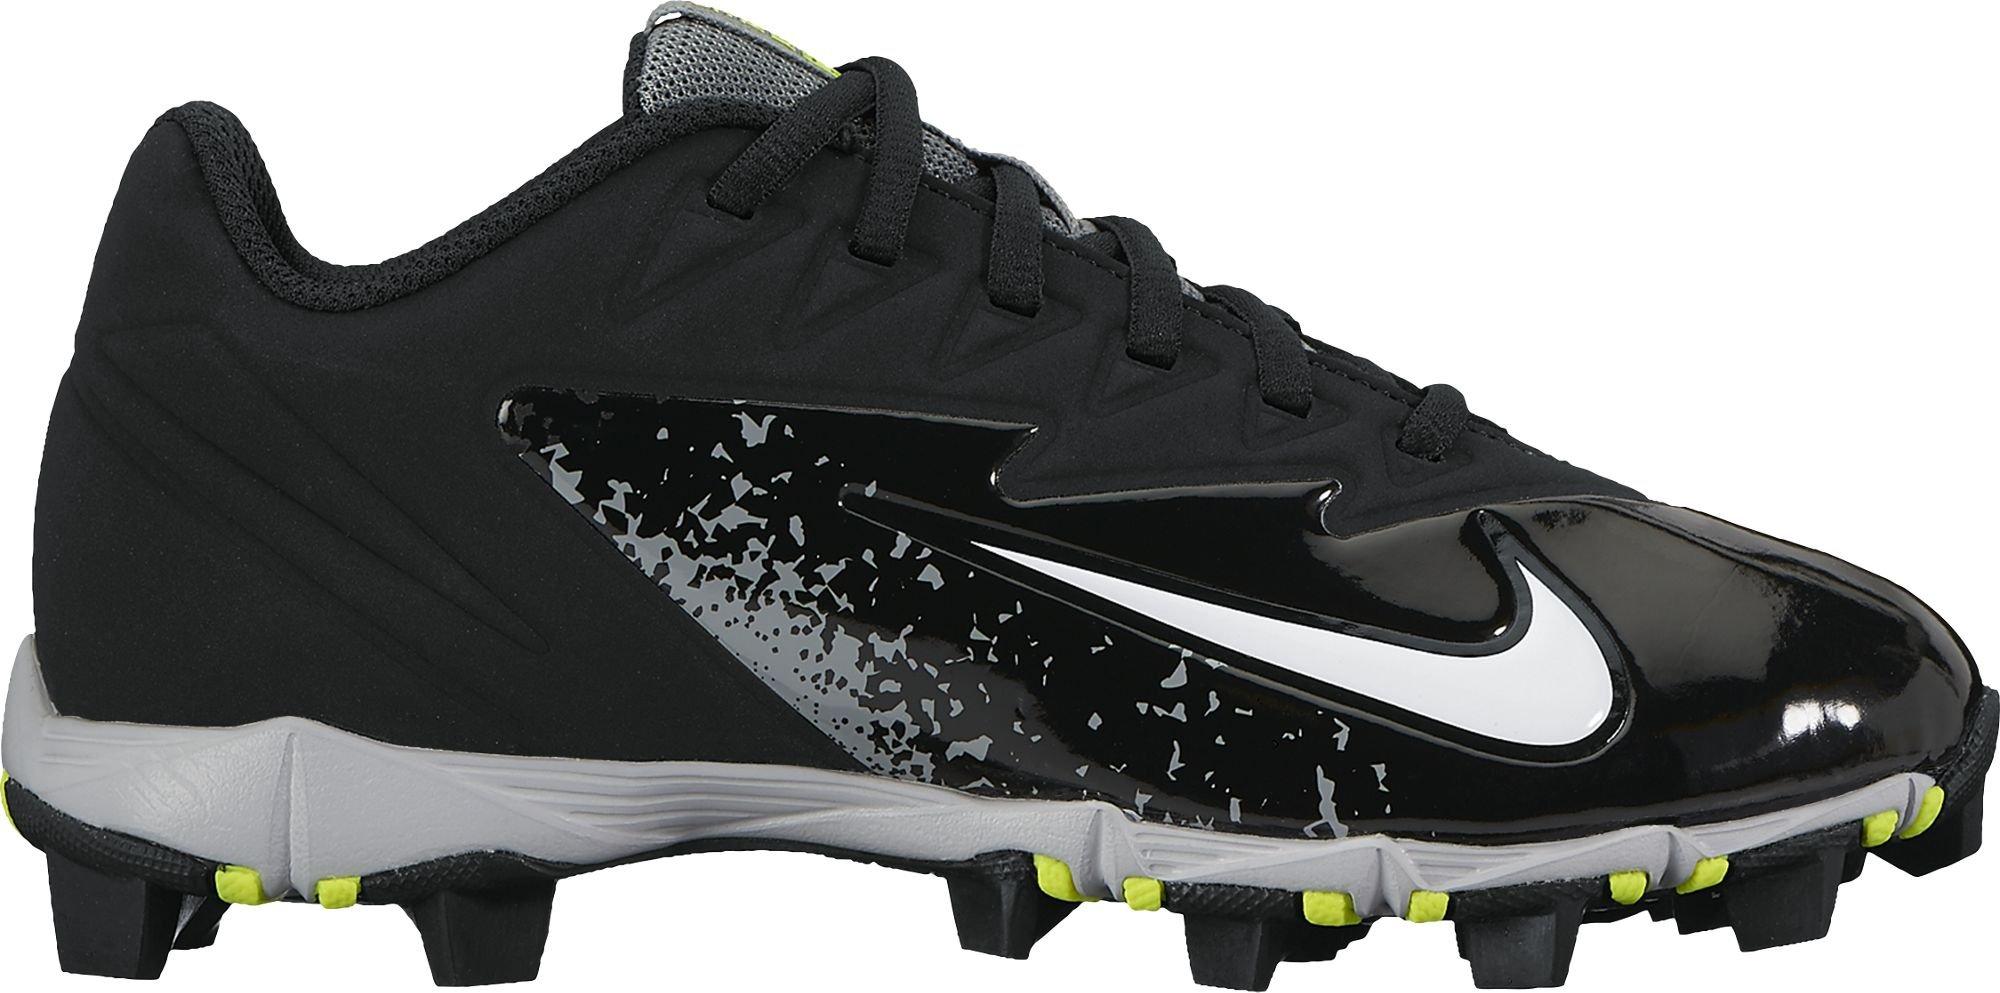 Nike Boy's Vapor Ultrafly Keystone Baseball Cleat Black/White/Wolf Grey/Cool Grey Size 13 Kids US